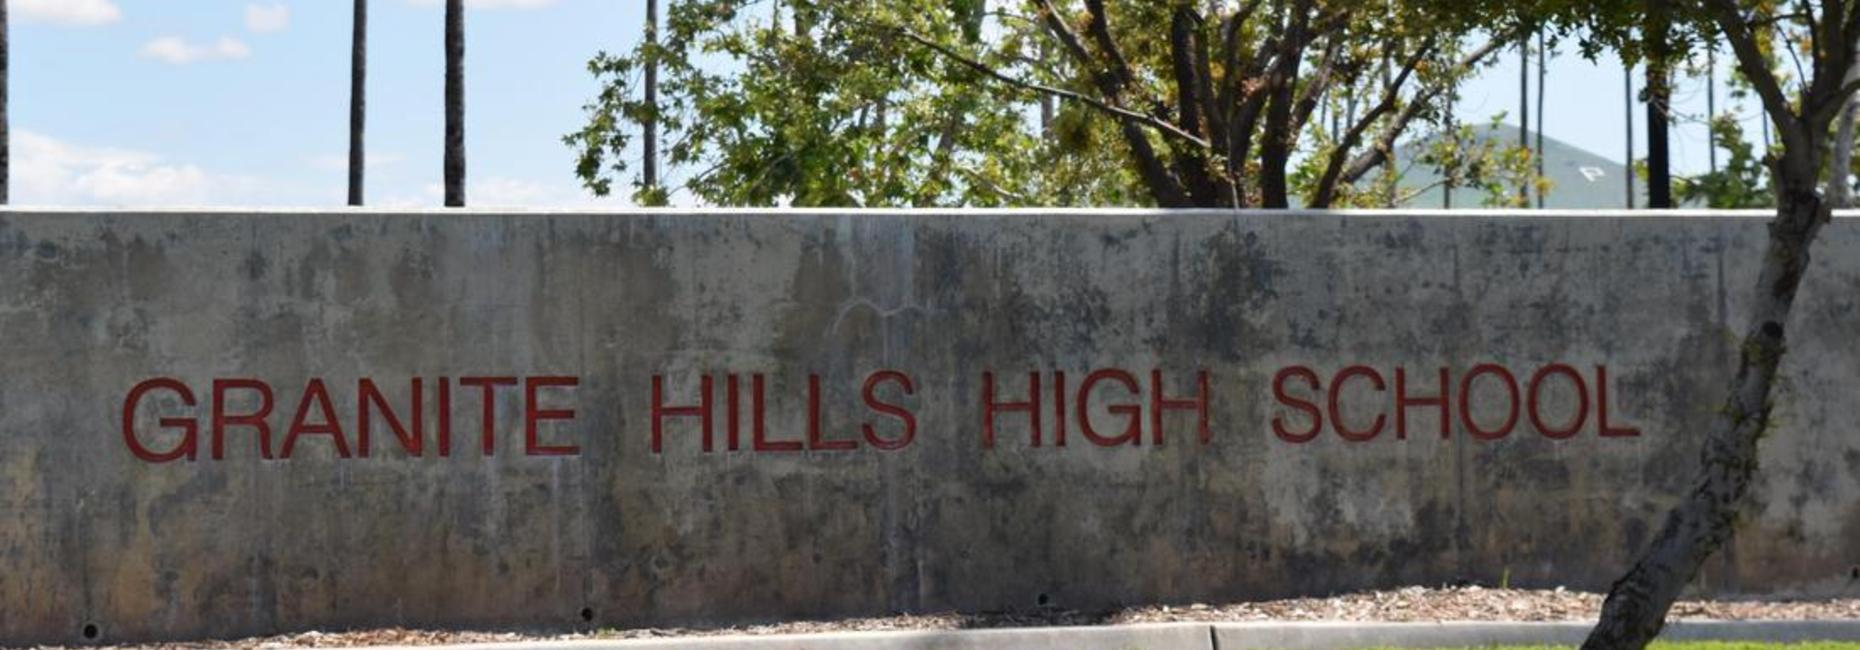 Granite Hills High